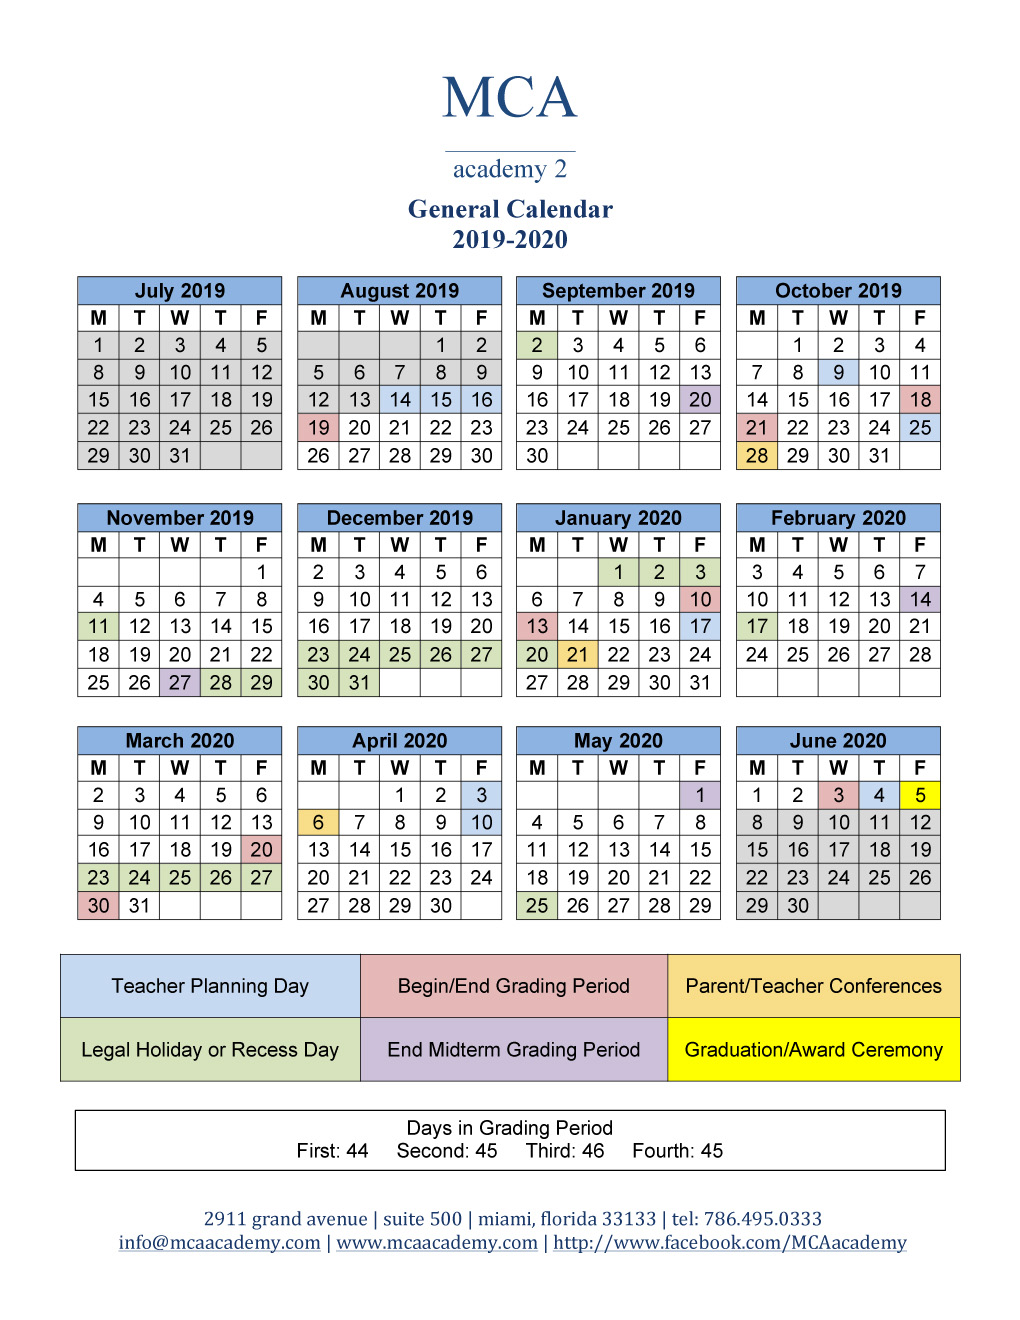 School-Christmas-Vacation-Starts-2020-Miami-Florida School Calendar 2019 2020   MCA Academy